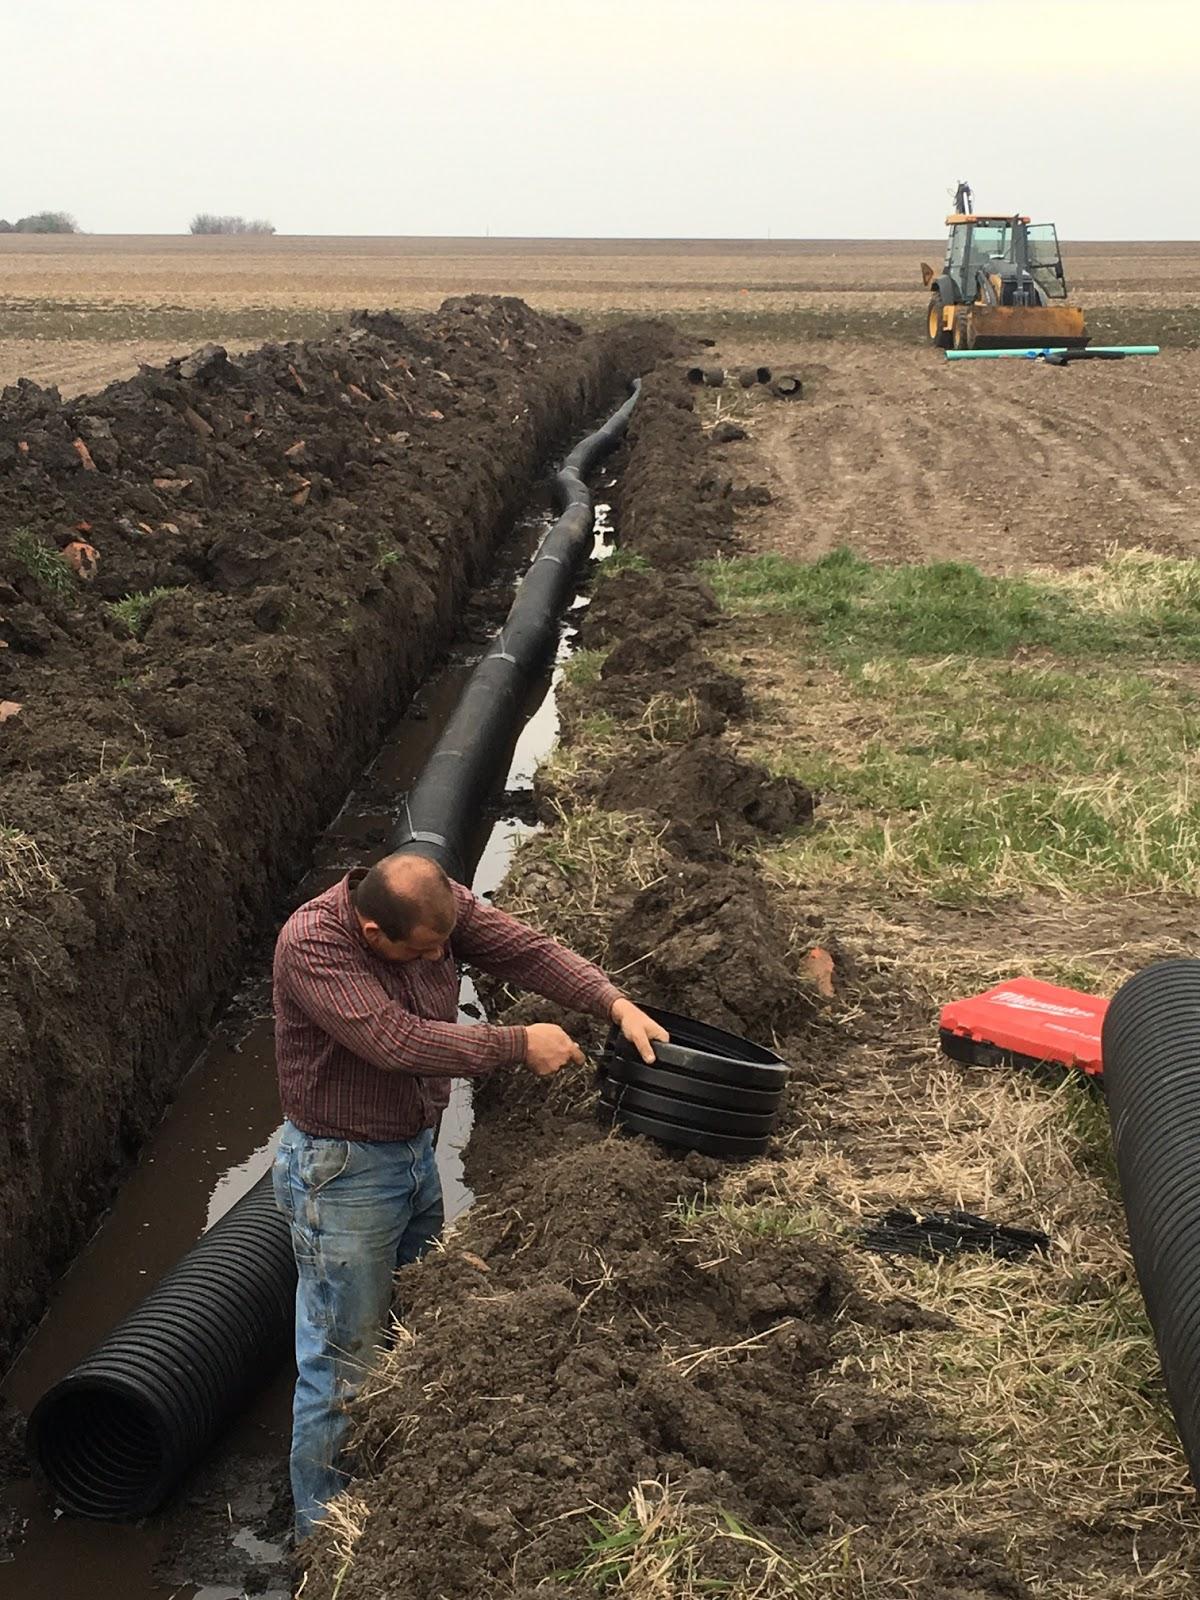 how to regenreate the soil on a run down farm